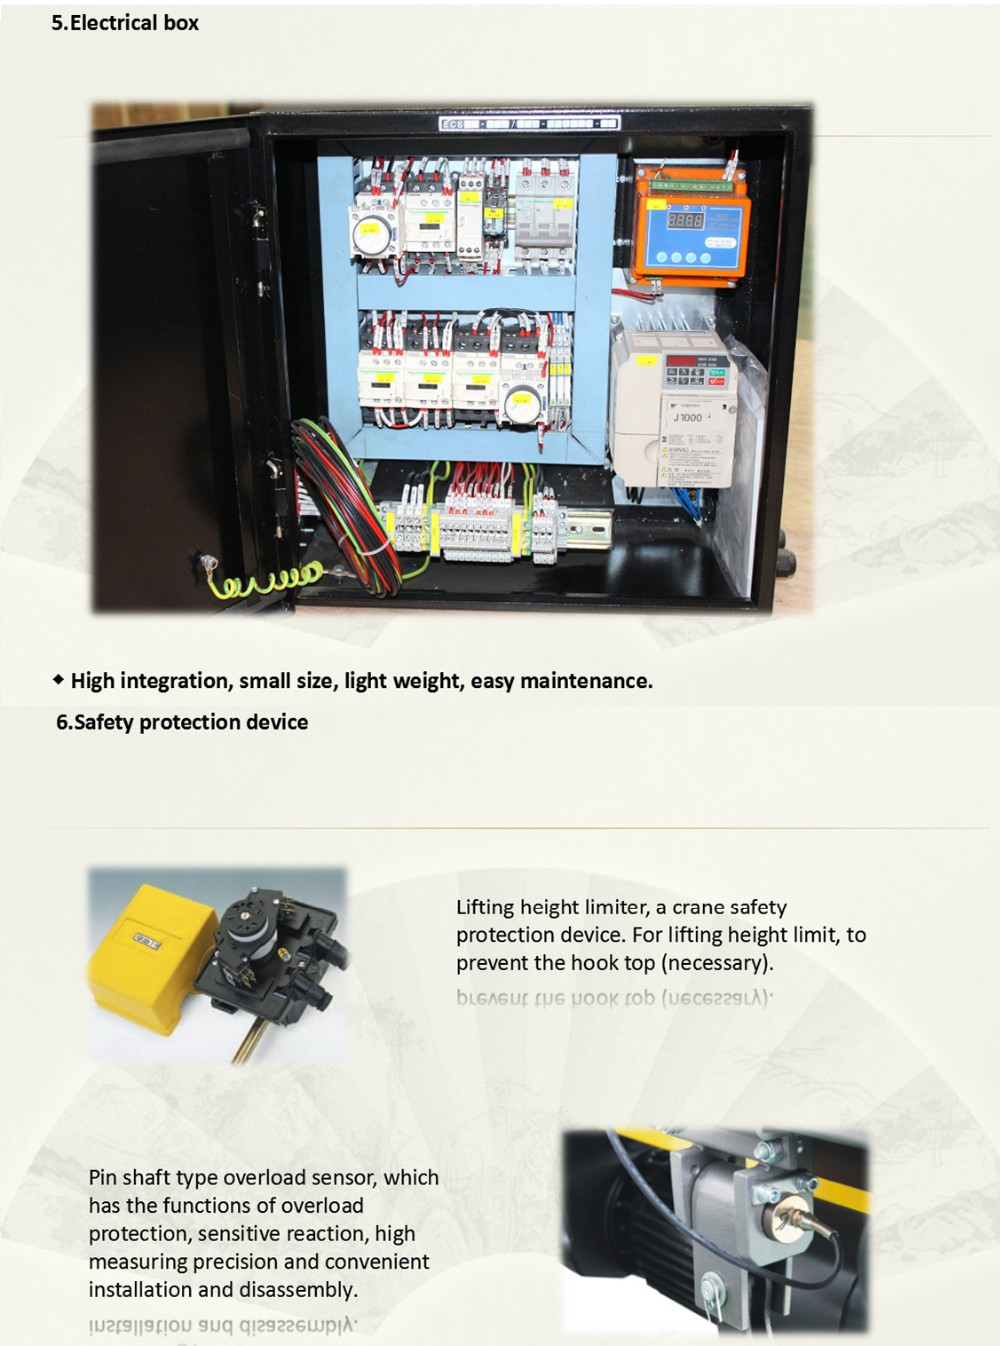 China EU Electric wire rope hoists manufacturers51.jpg